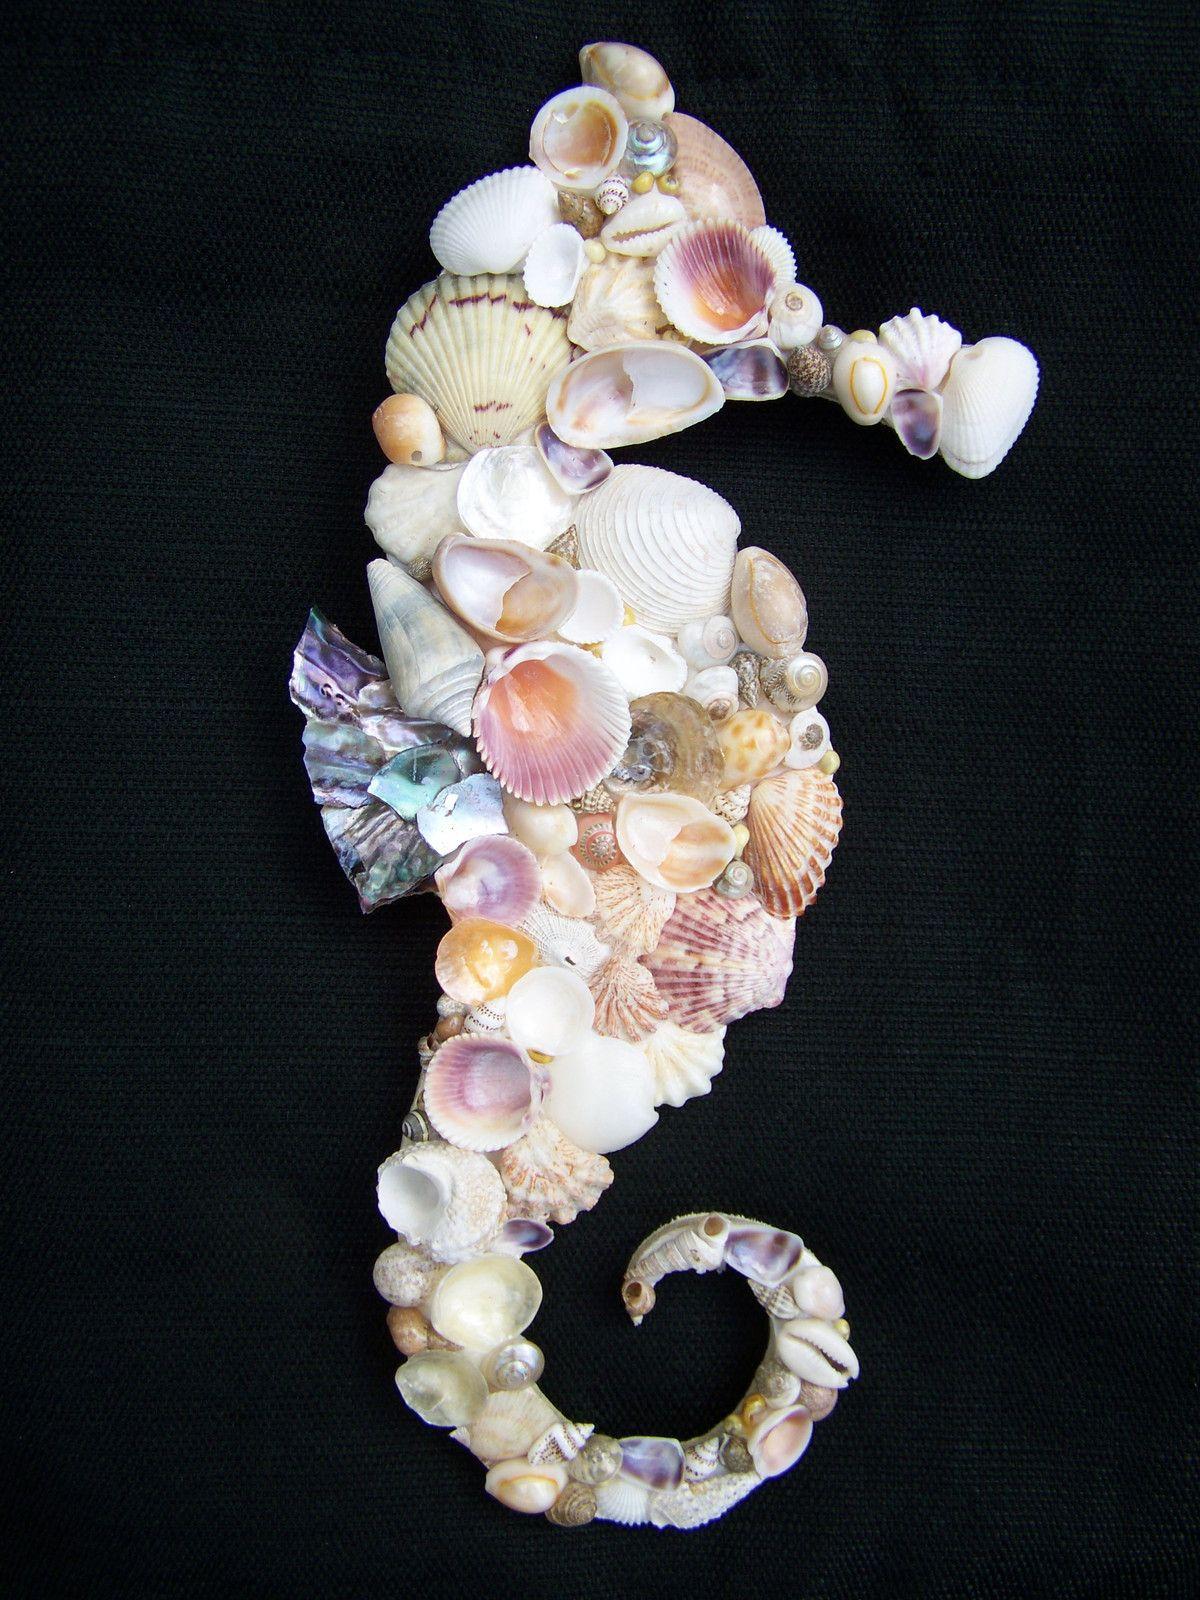 Seahorse of Seashells Beach Cottage Wall Hanging Coastal Decor | eBay--for inspiration